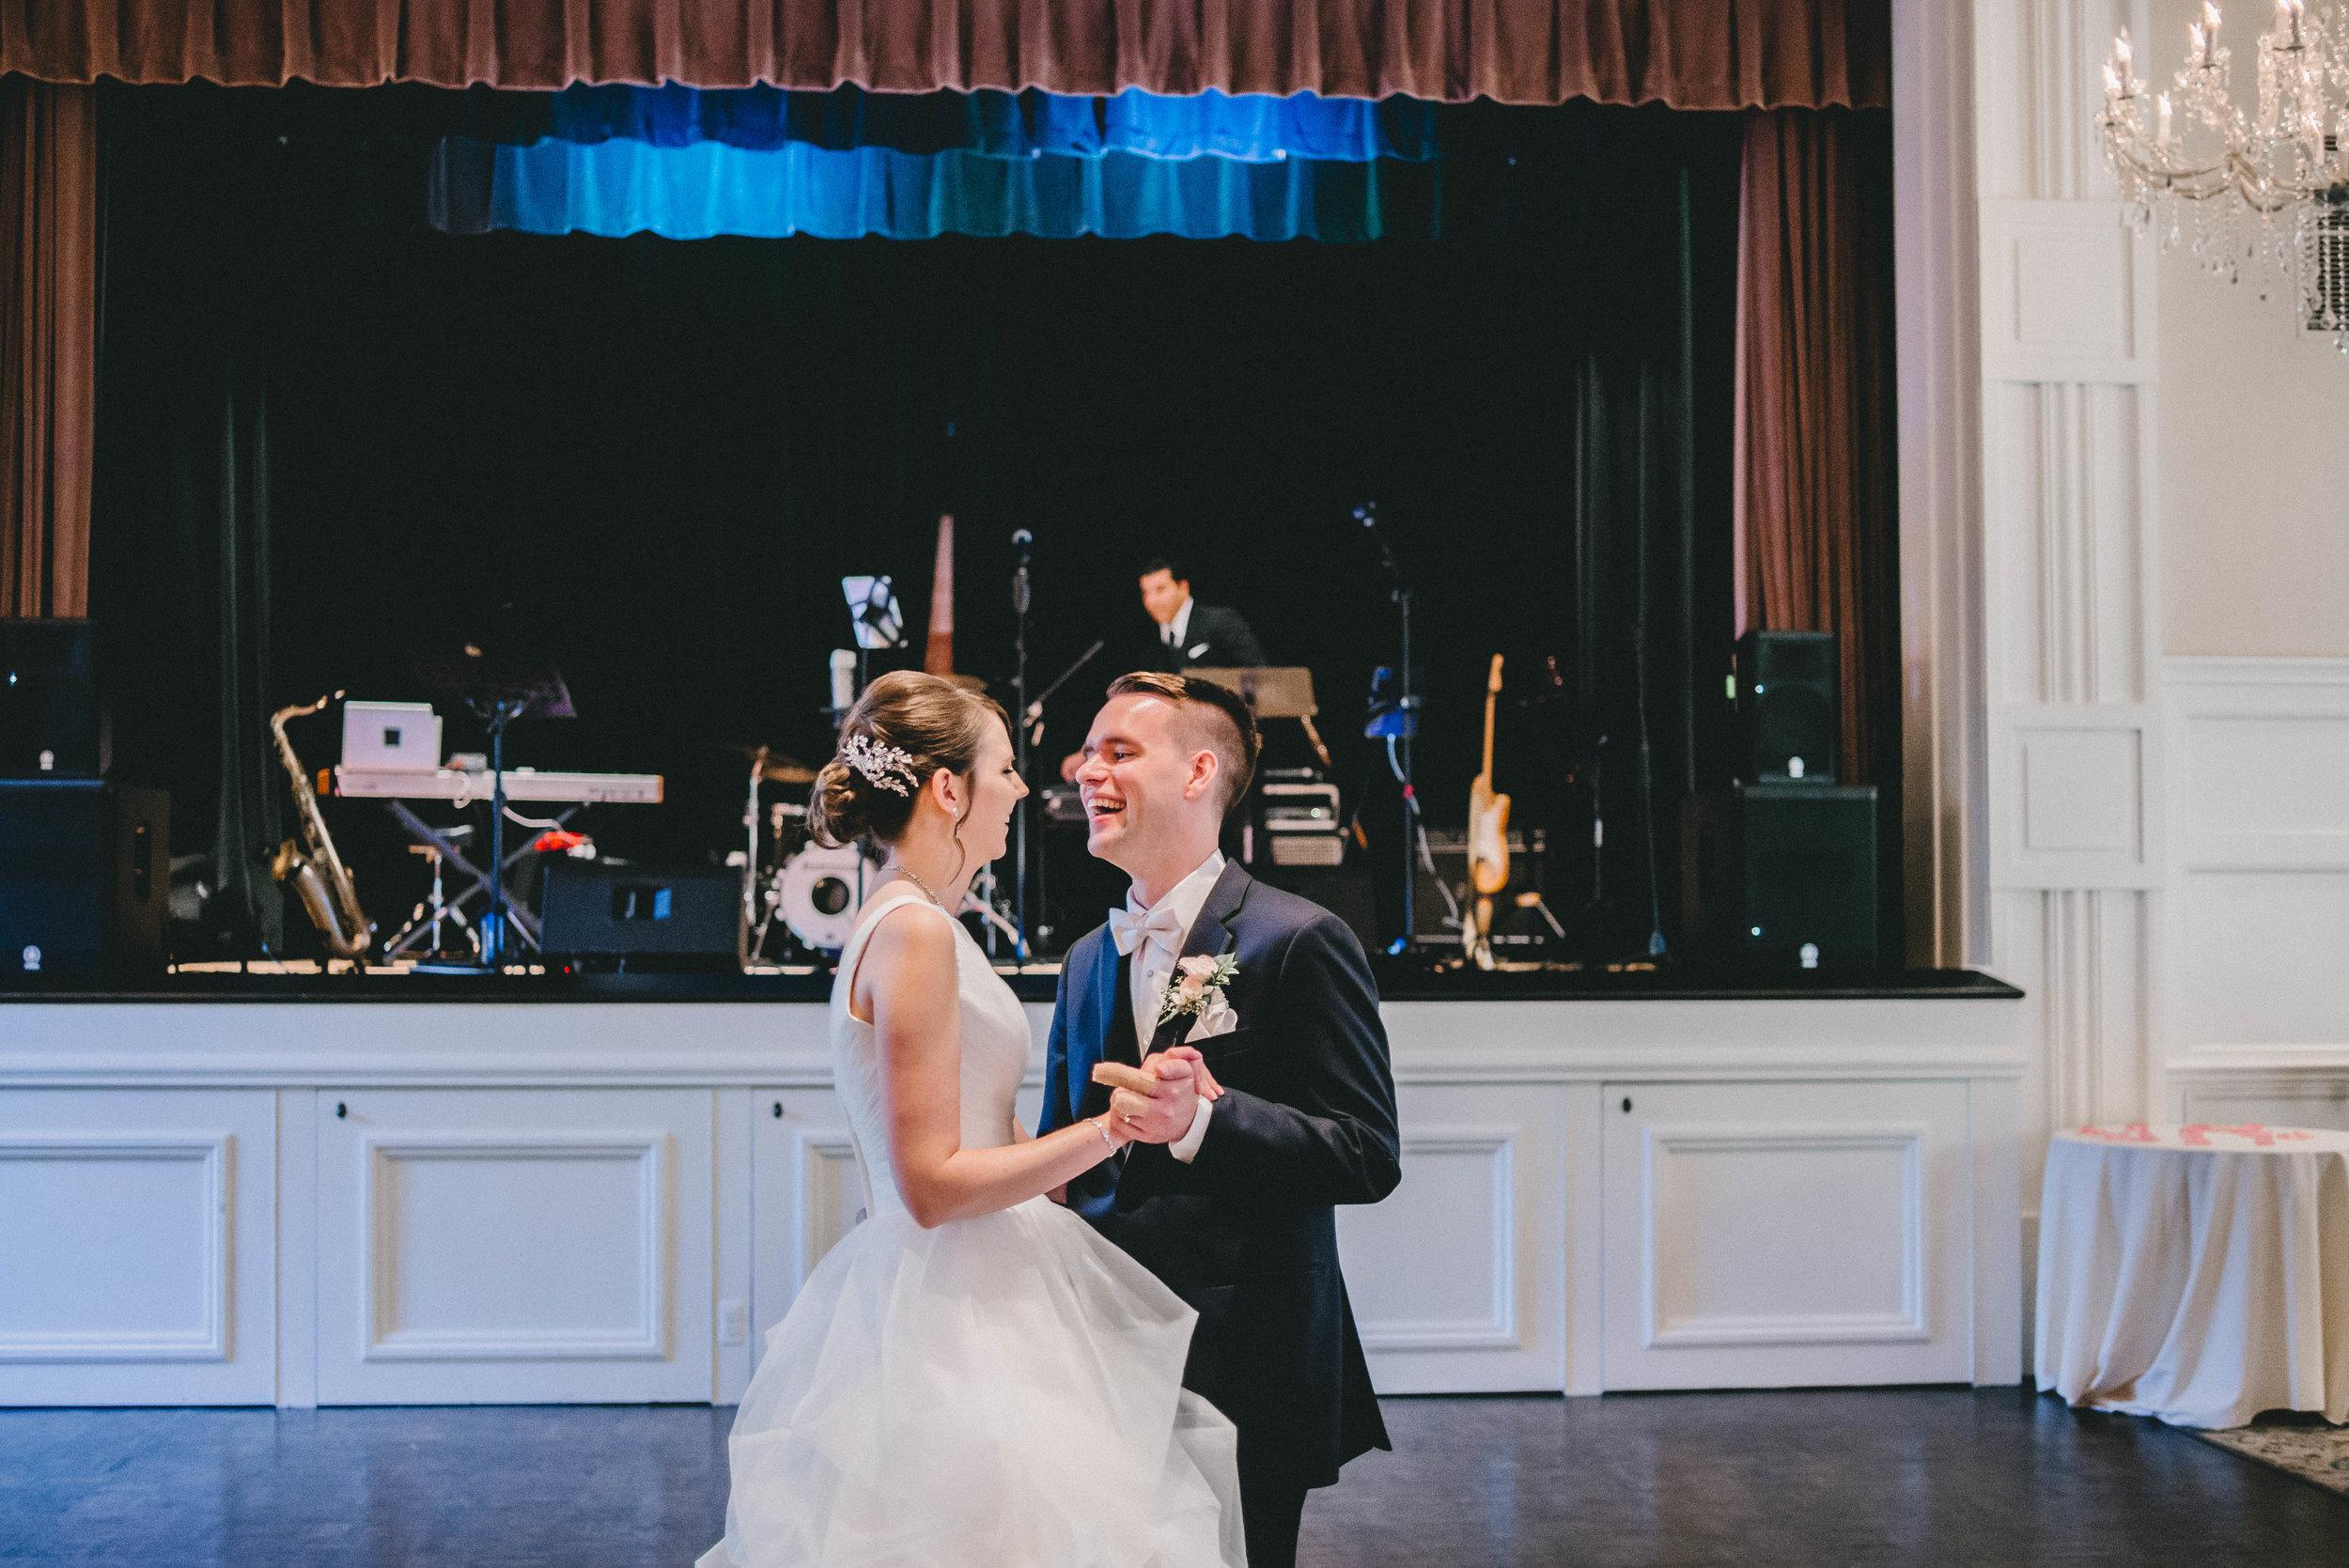 Kara and Mike Wedding-20160904-19-05-49.jpg